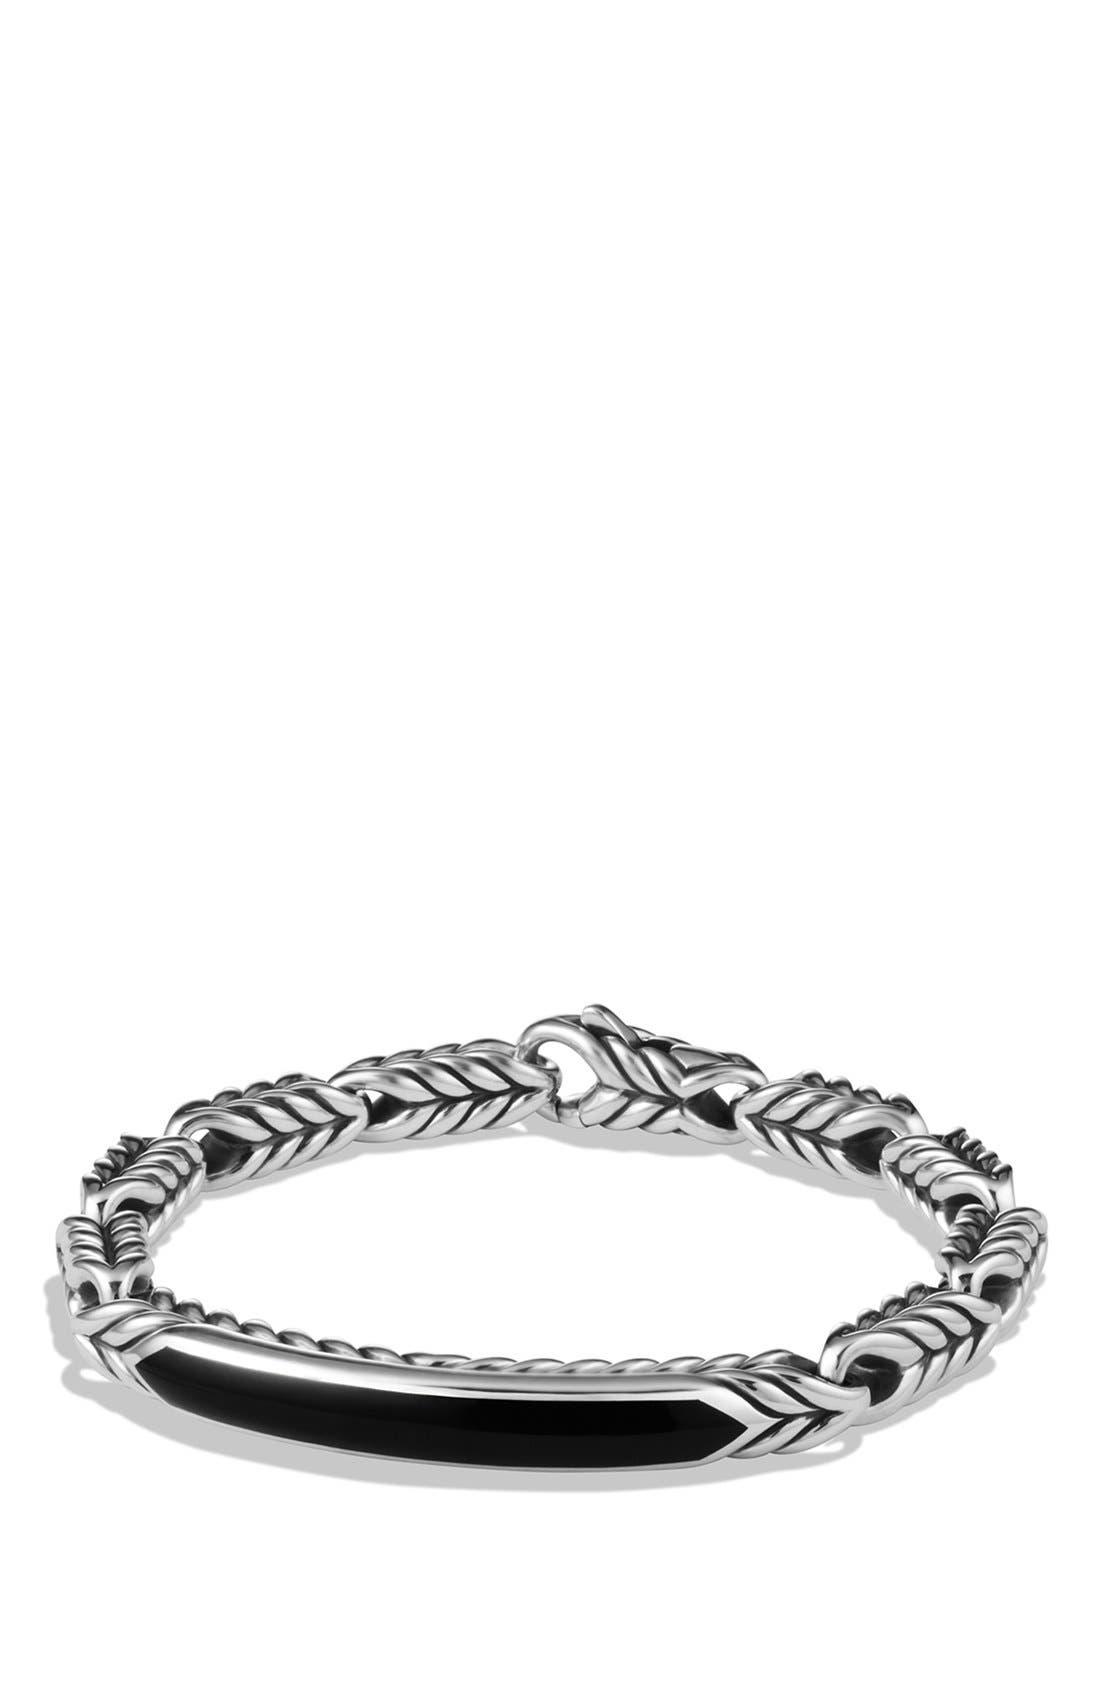 'Chevron' ID Bracelet,                             Main thumbnail 1, color,